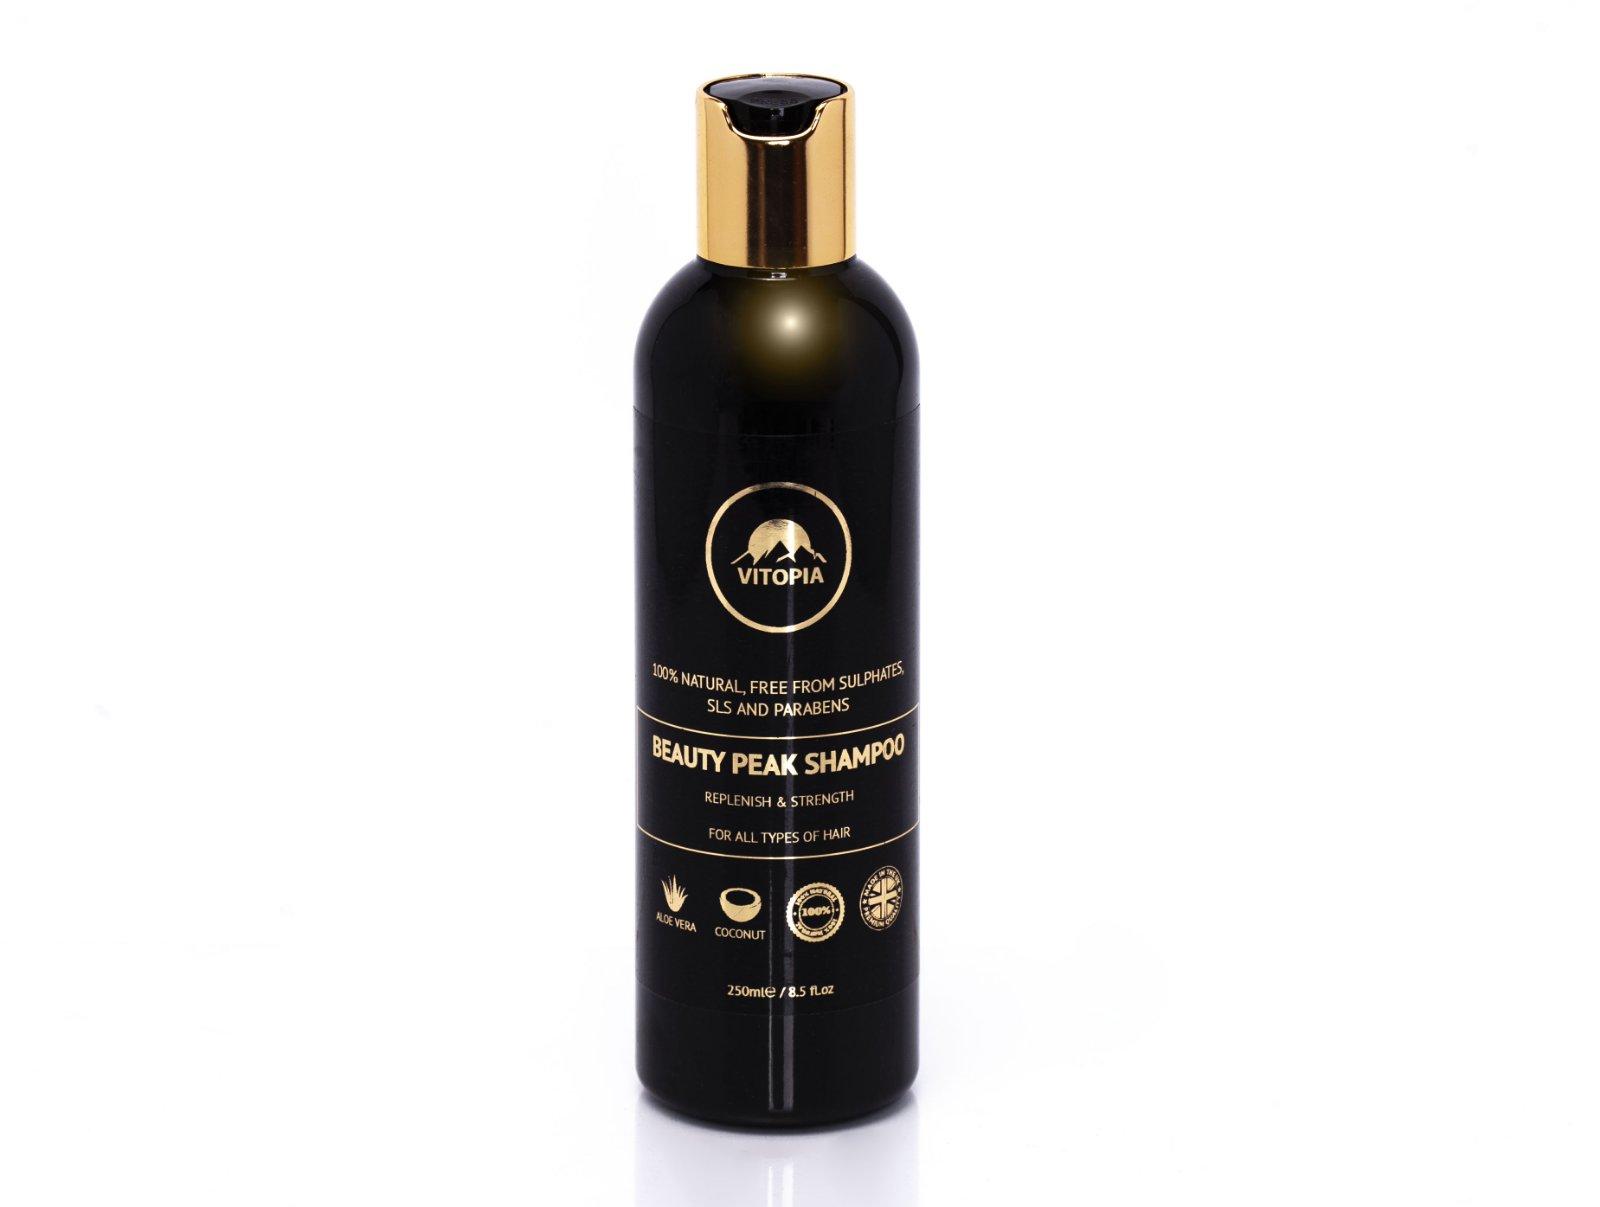 Beauty Peak Shampoo - Replenish & Strengthen